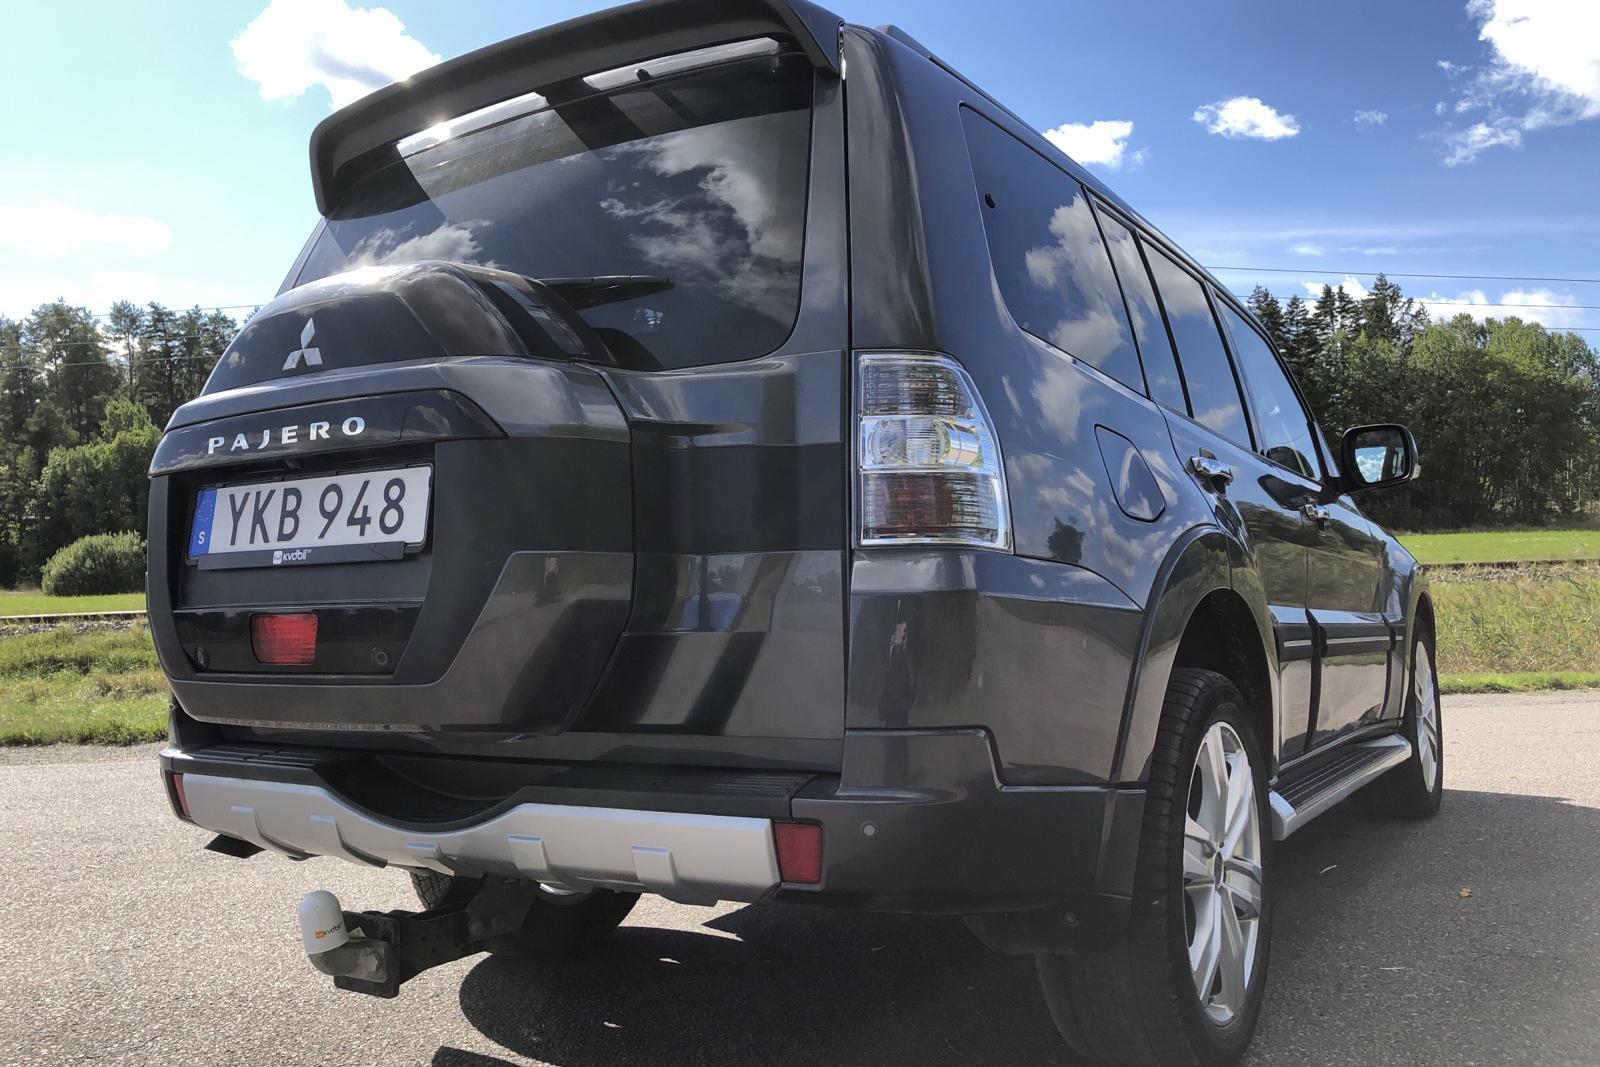 Mitsubishi Pajero Wagon 3.2 DI-D (200hk) - 5 153 mil - Automat - grå - 2017